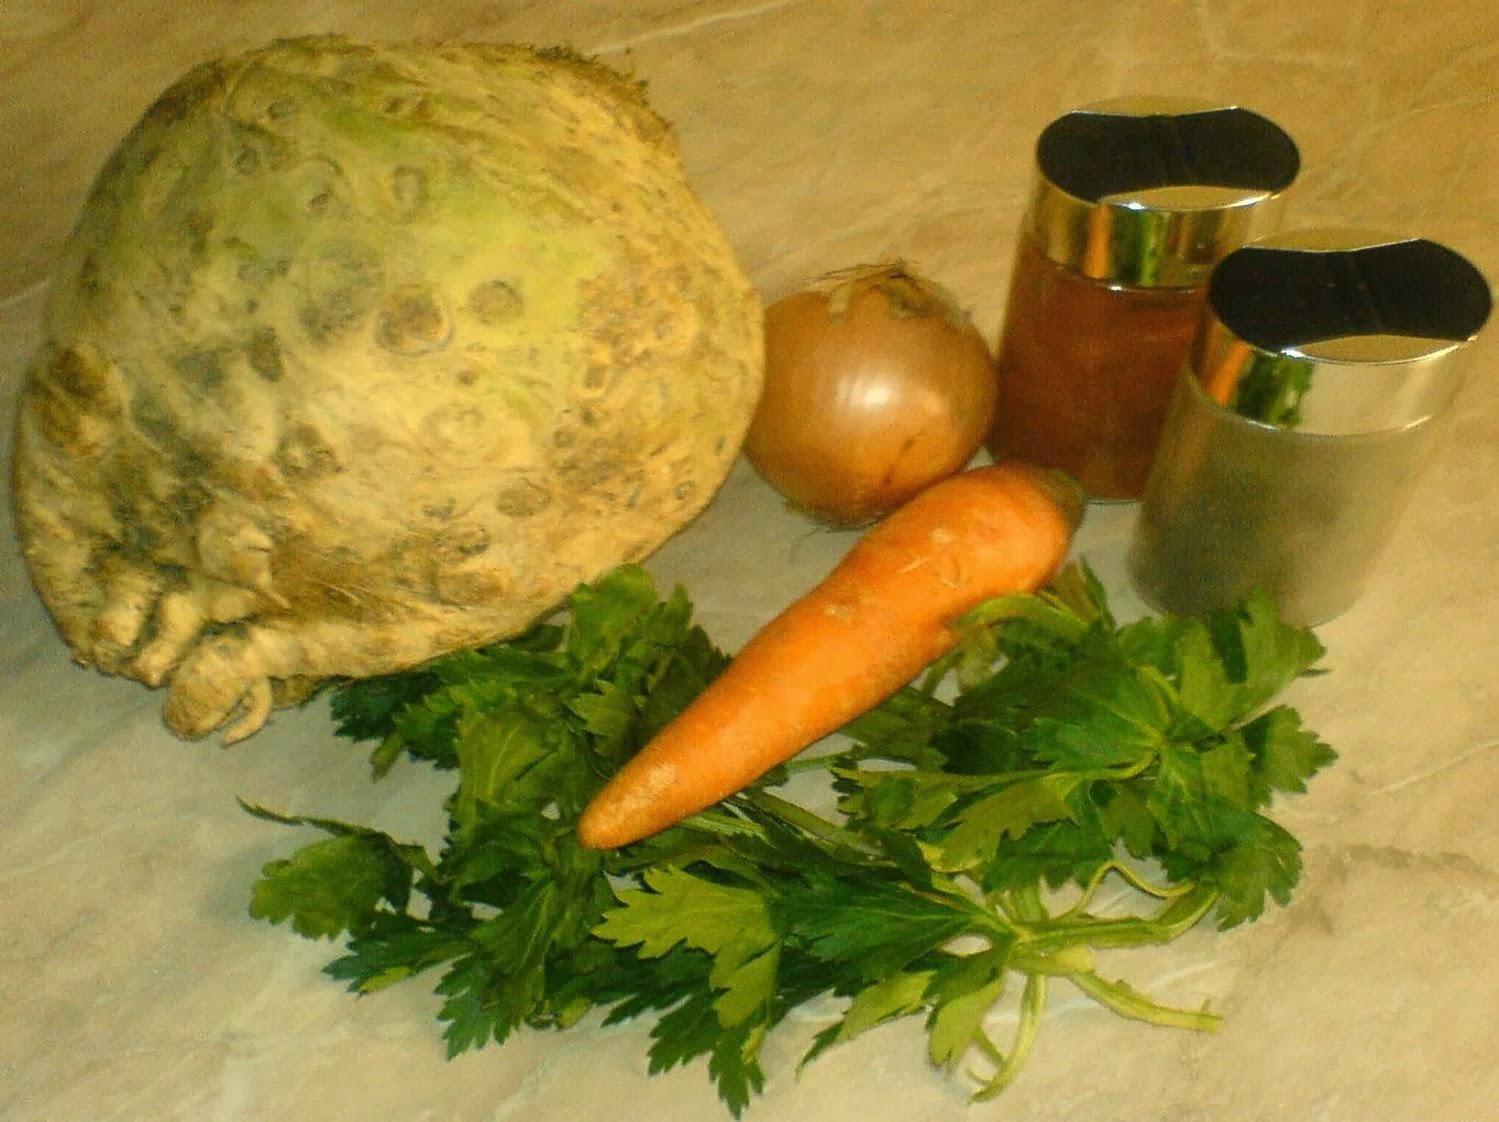 retete de post, retete de mancare, supa crema de telina, retete culinare, preparate culinare, retete dietetice, diete de slabit, cura de slabire, macaruri de post, retete cu legume, supa crema de legume, retete afrodisiace, retete supe creme, supe, supe creme, retete supe creme de legume, crema de telina, crema de legume, supa crema de telina ingrediente,